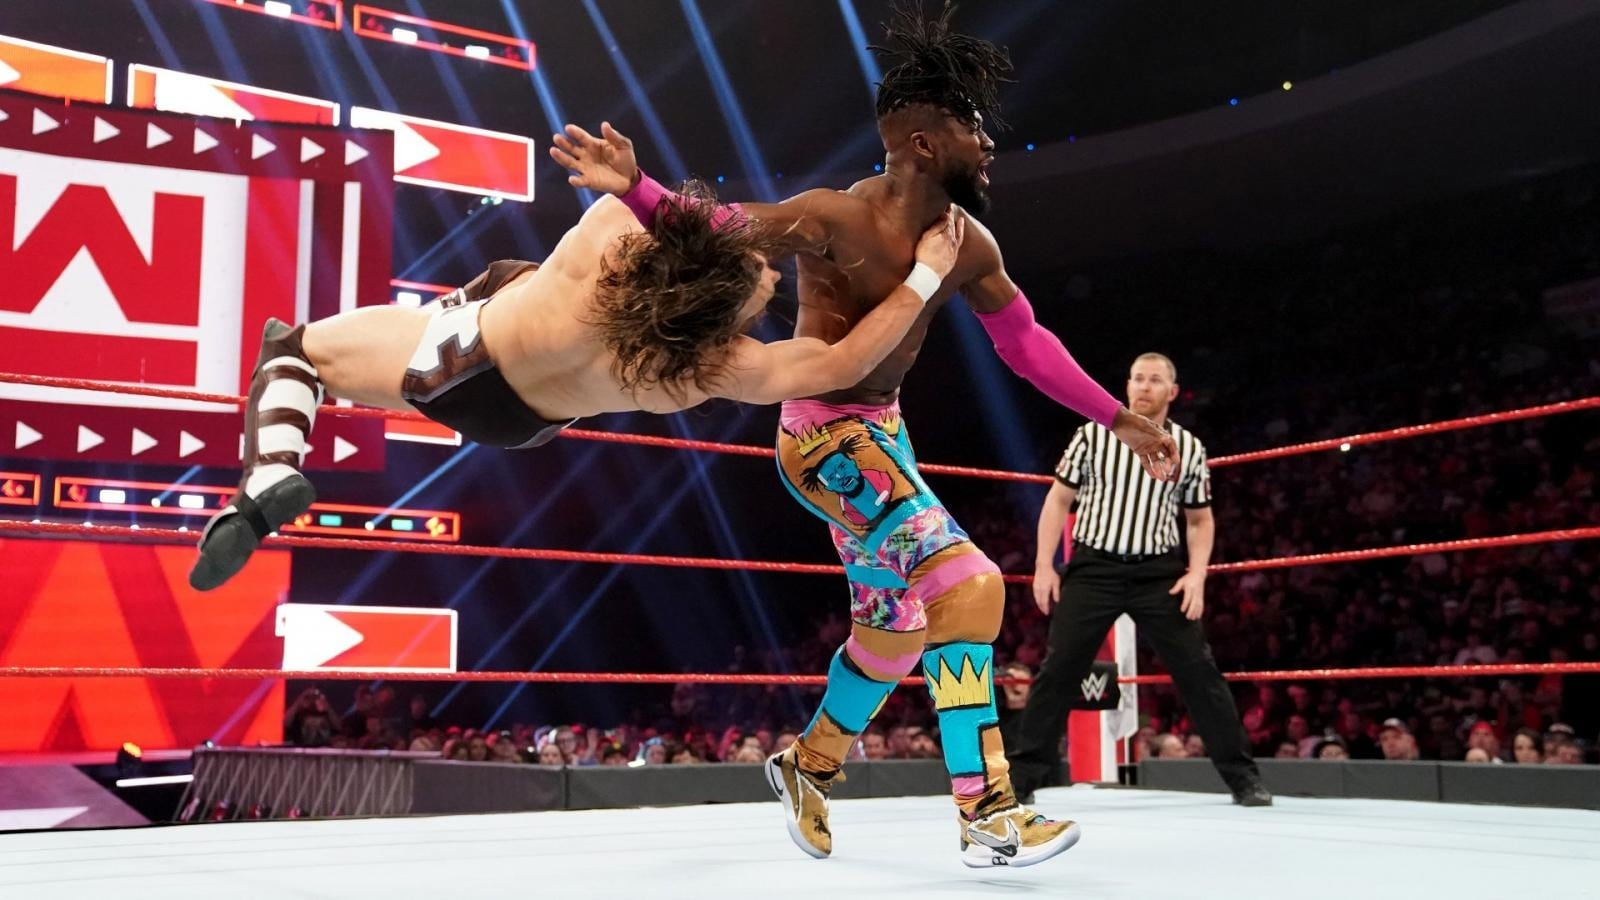 WWE Raw Season 27 :Episode 18  May 6, 2019 (Cincinnati, OH)